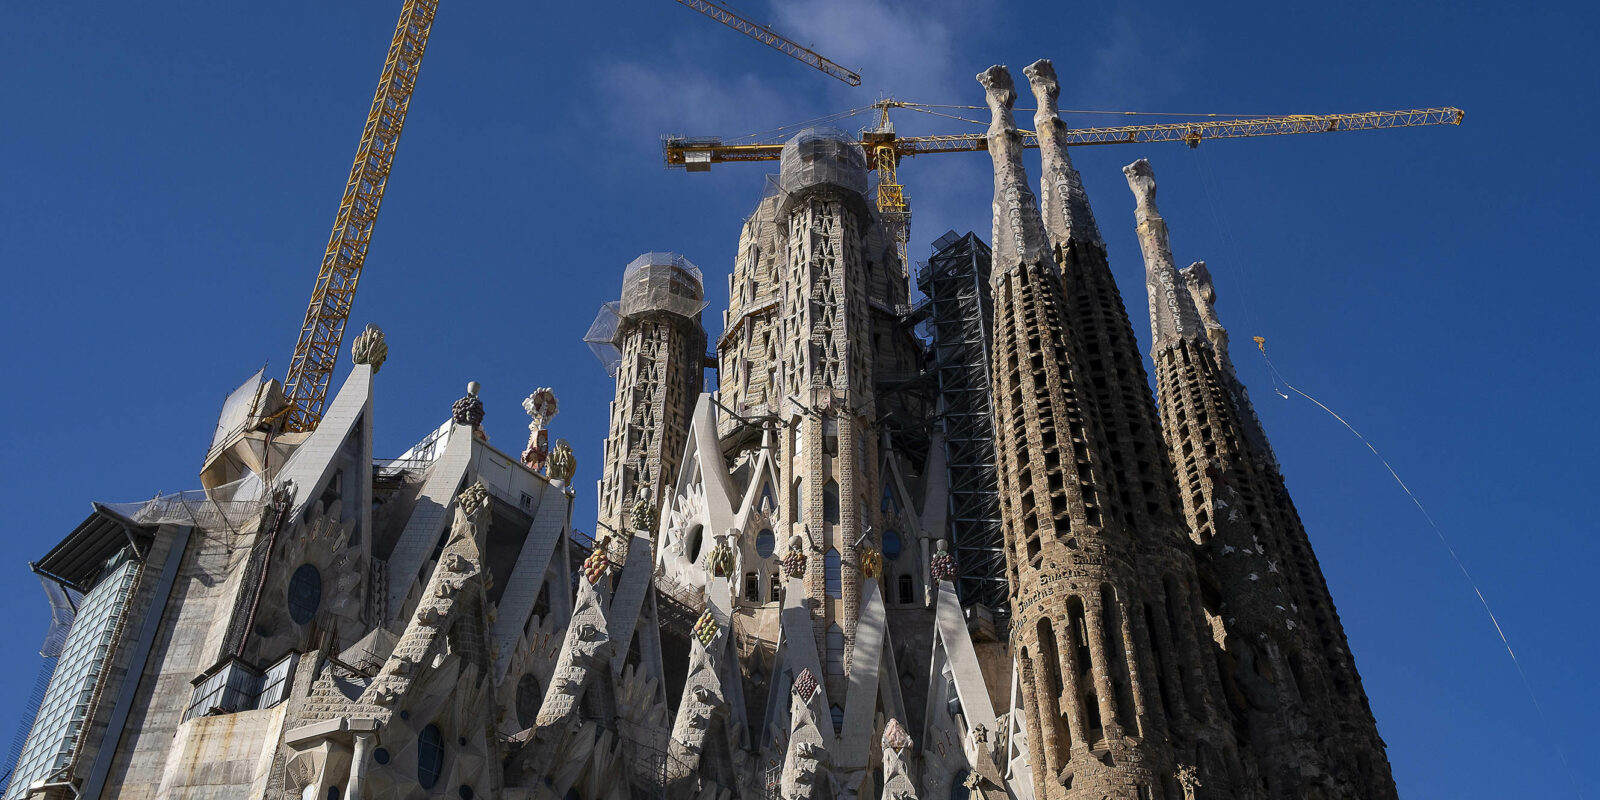 19.01.2021, Barcelona Sagrada Família.  foto: Jordi Play